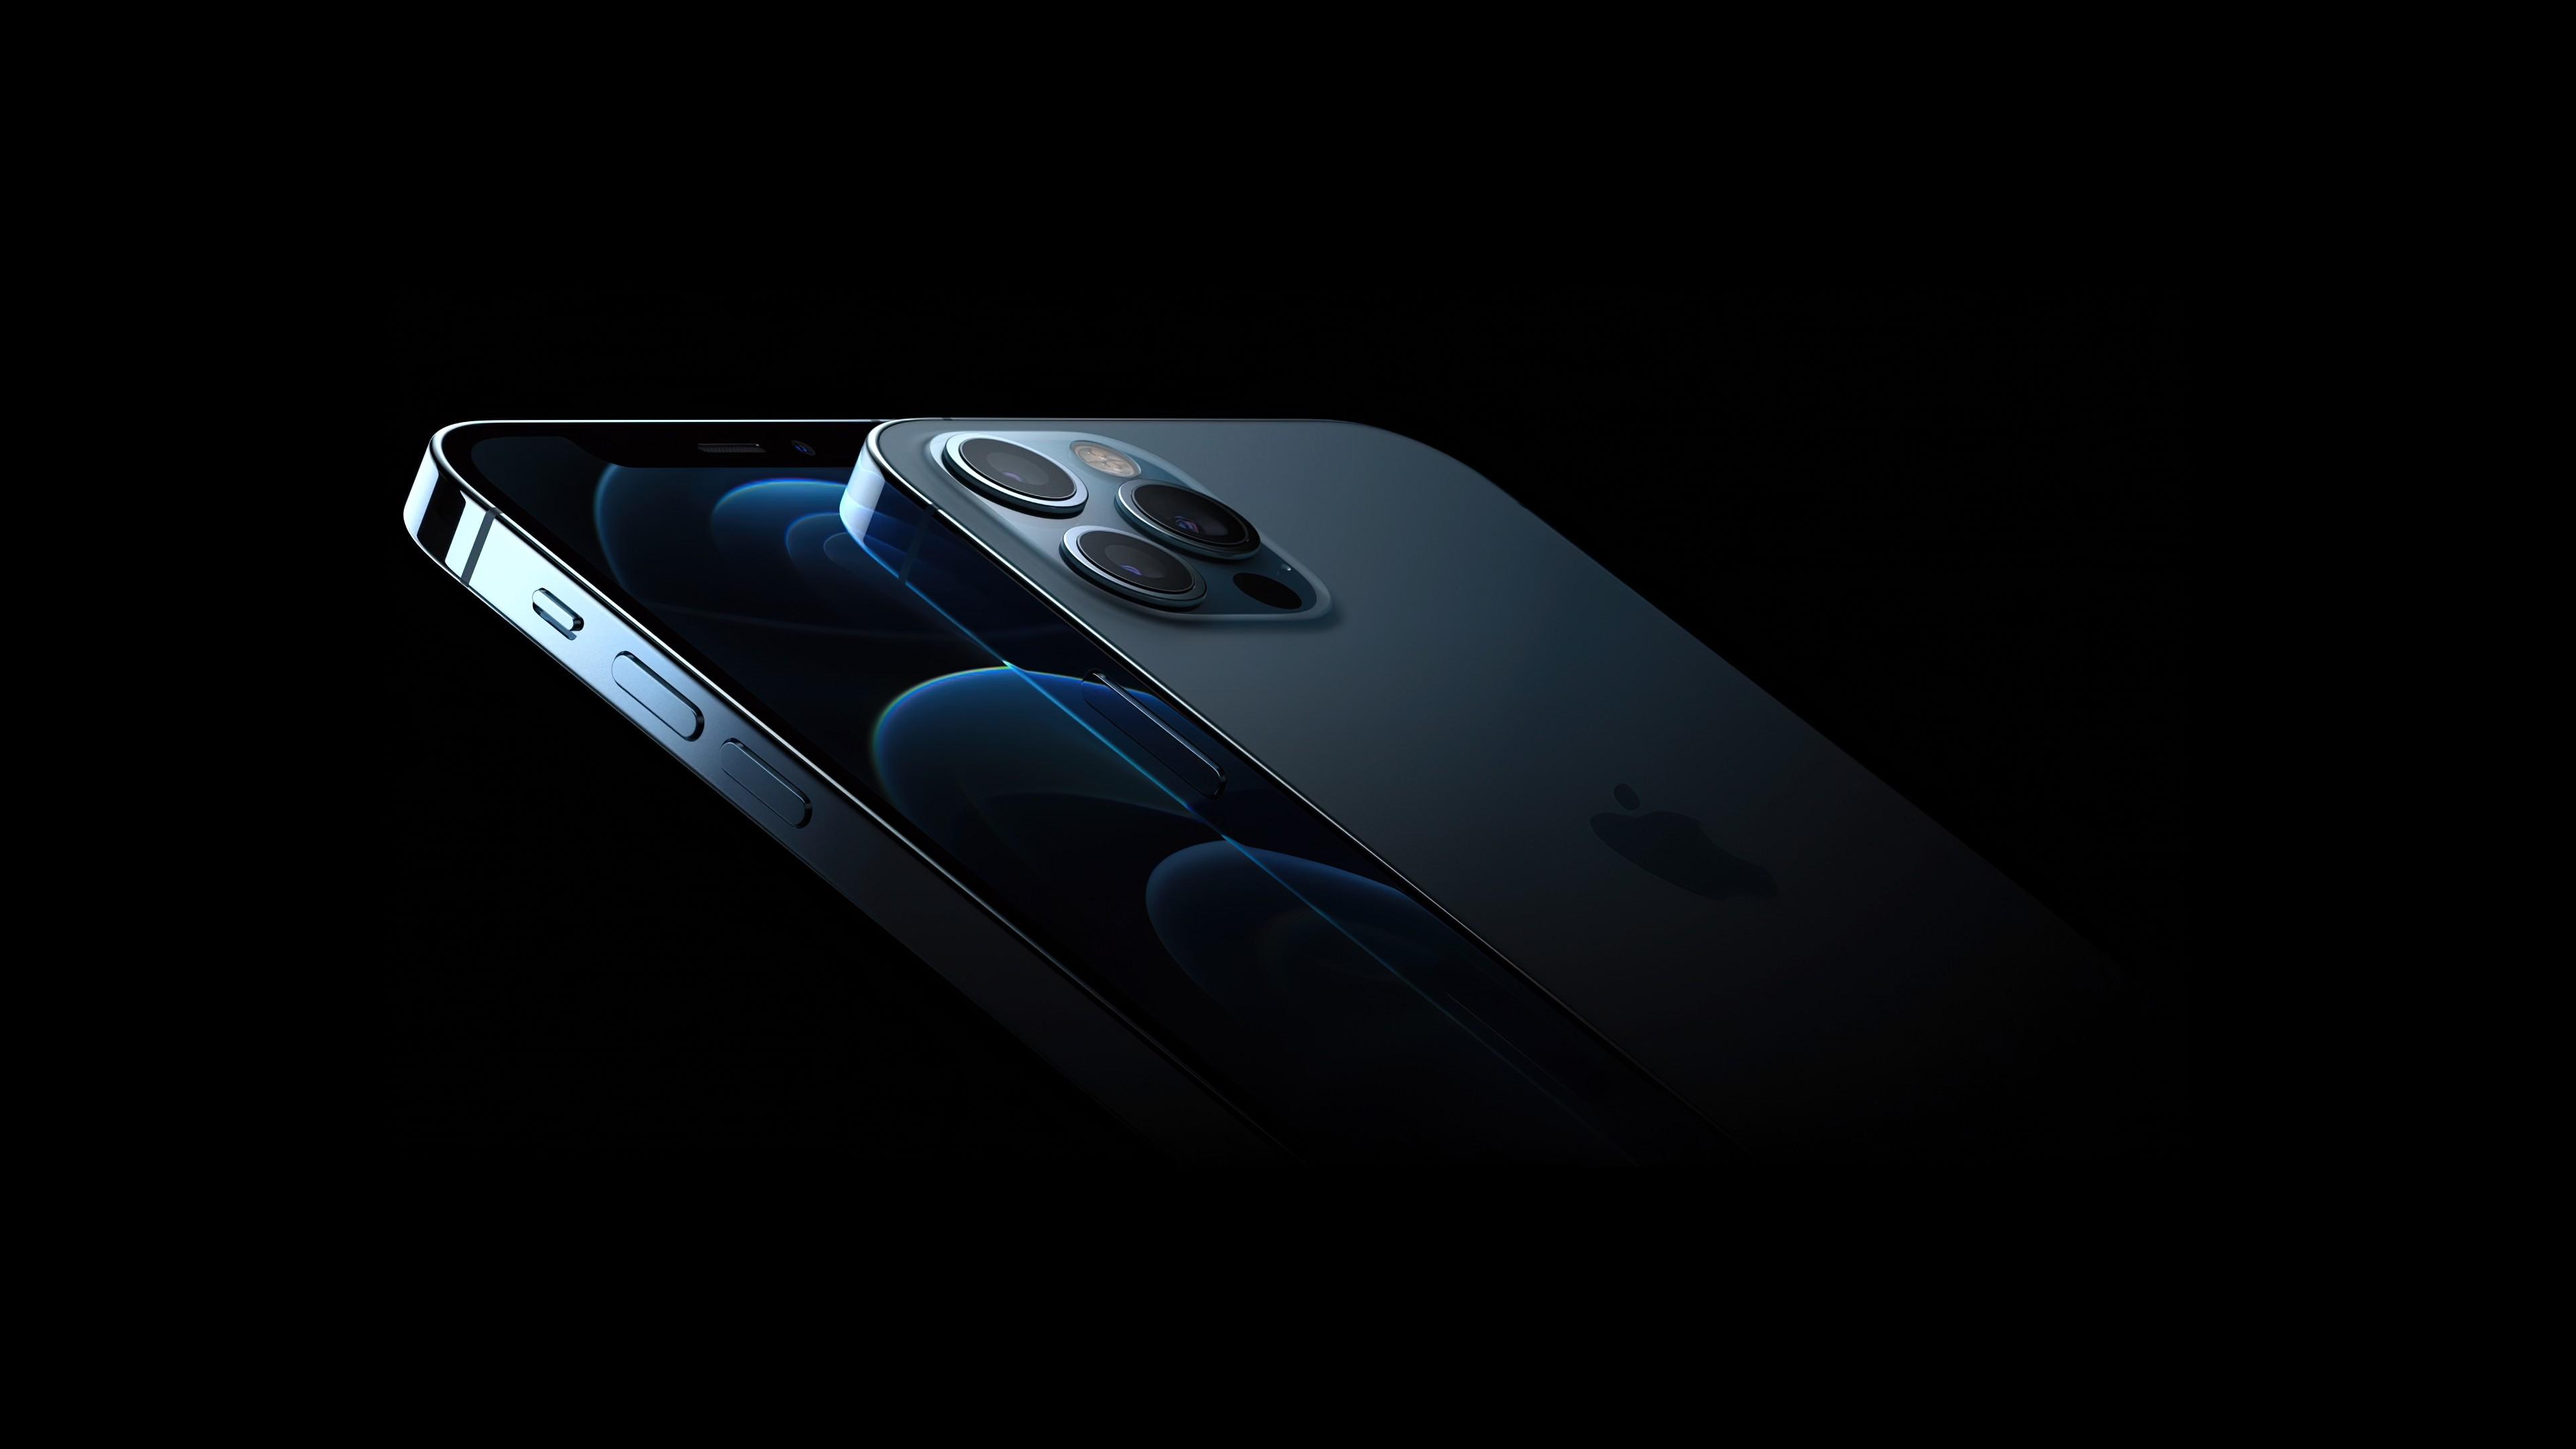 Wallpaper iPhone 12 Pro Max, Apple October 2020 Event, 4K ...